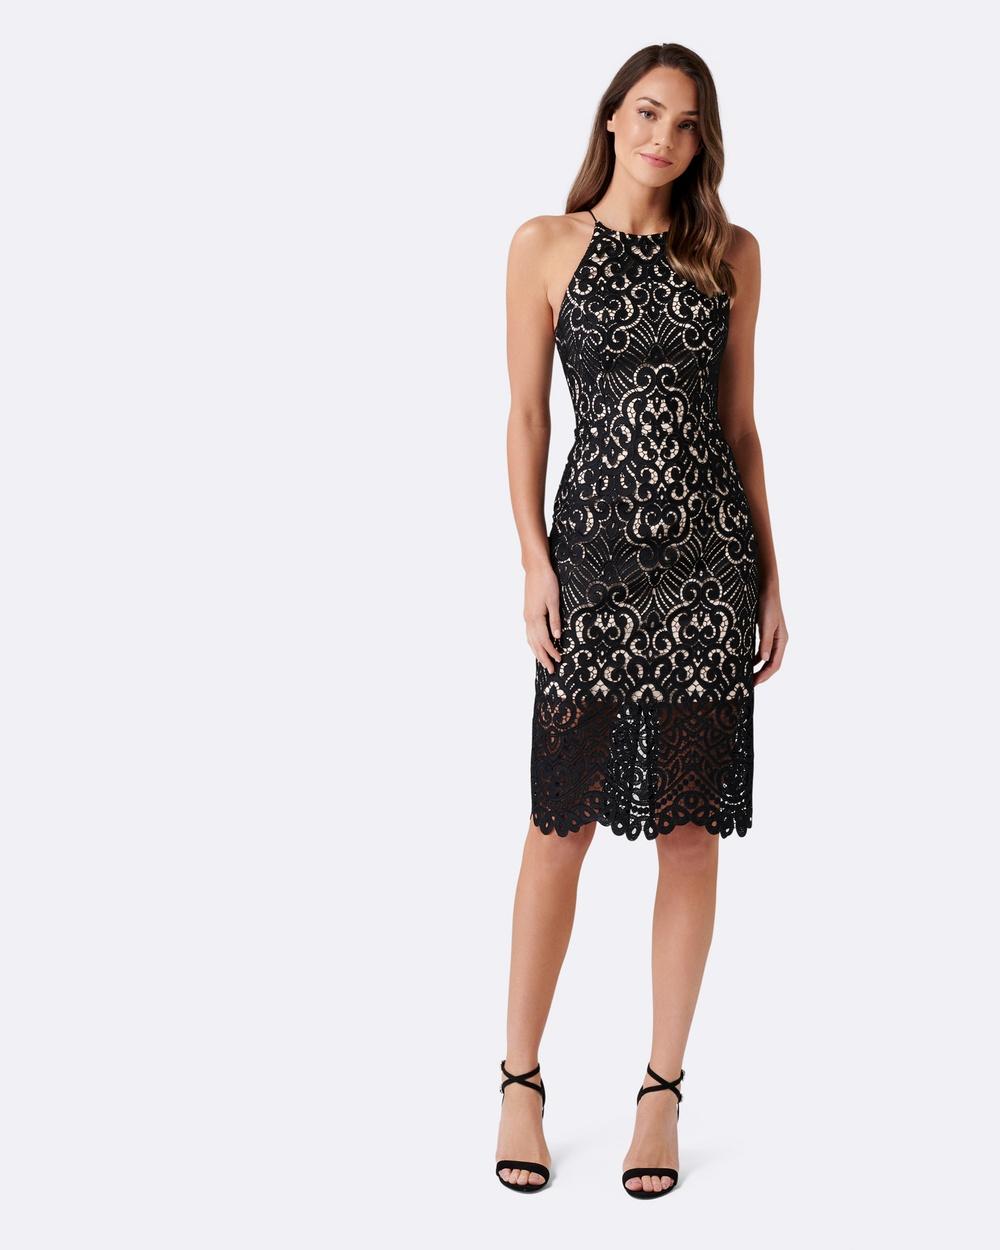 031279fffe4 Forever New Debbie Lace Pencil Dress Bridesmaid Dresses Black Debbie Lace  Pencil Dress